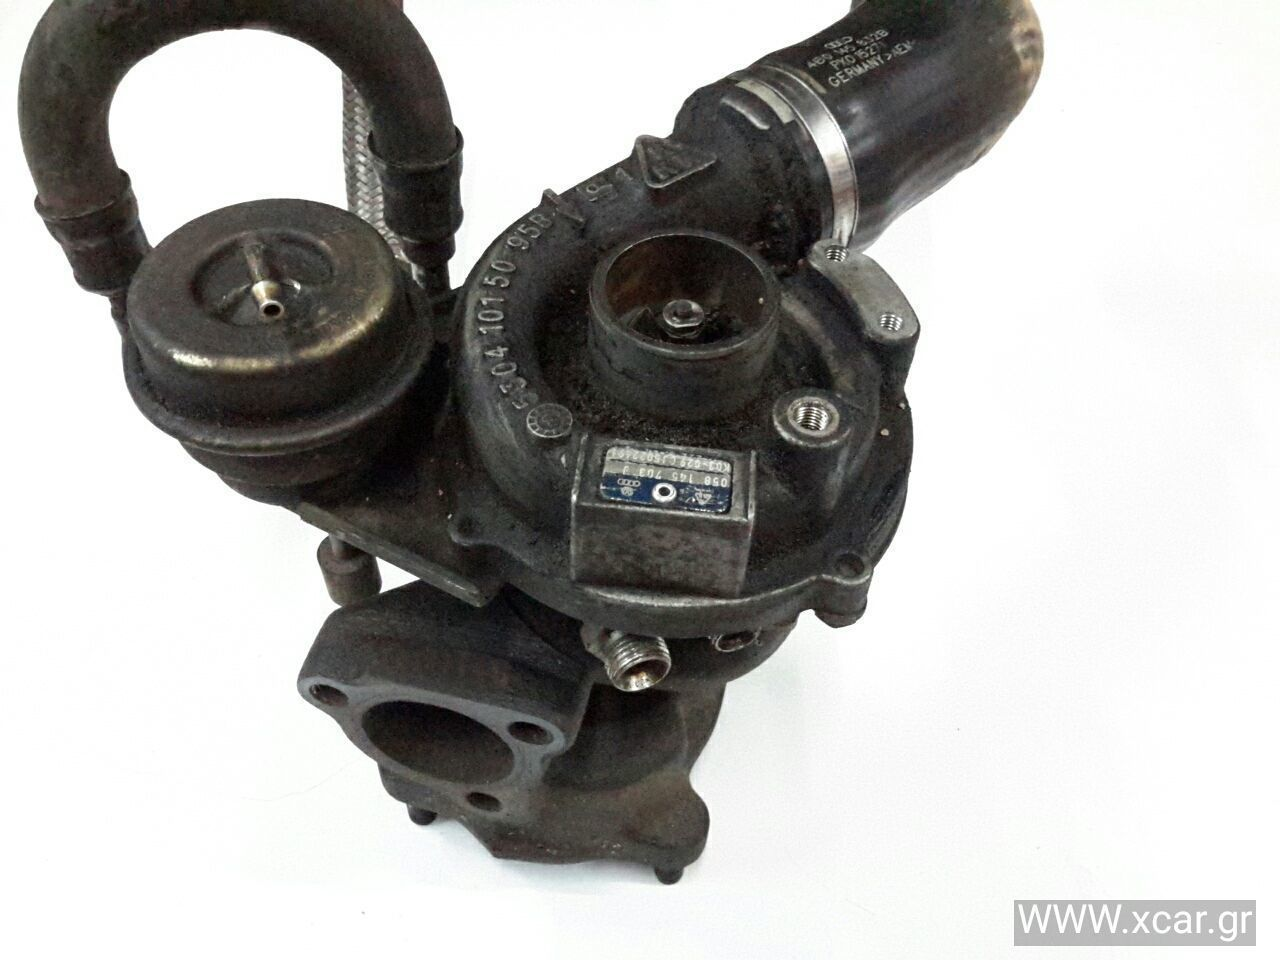 Turbo-Τουρμπίνα VW PASSAT Sedan / 4dr 2000 - 2005 ( 3B3  } 1800  ( AWL  } ( AWT  }  Petrol  150  Turbo #058145703J